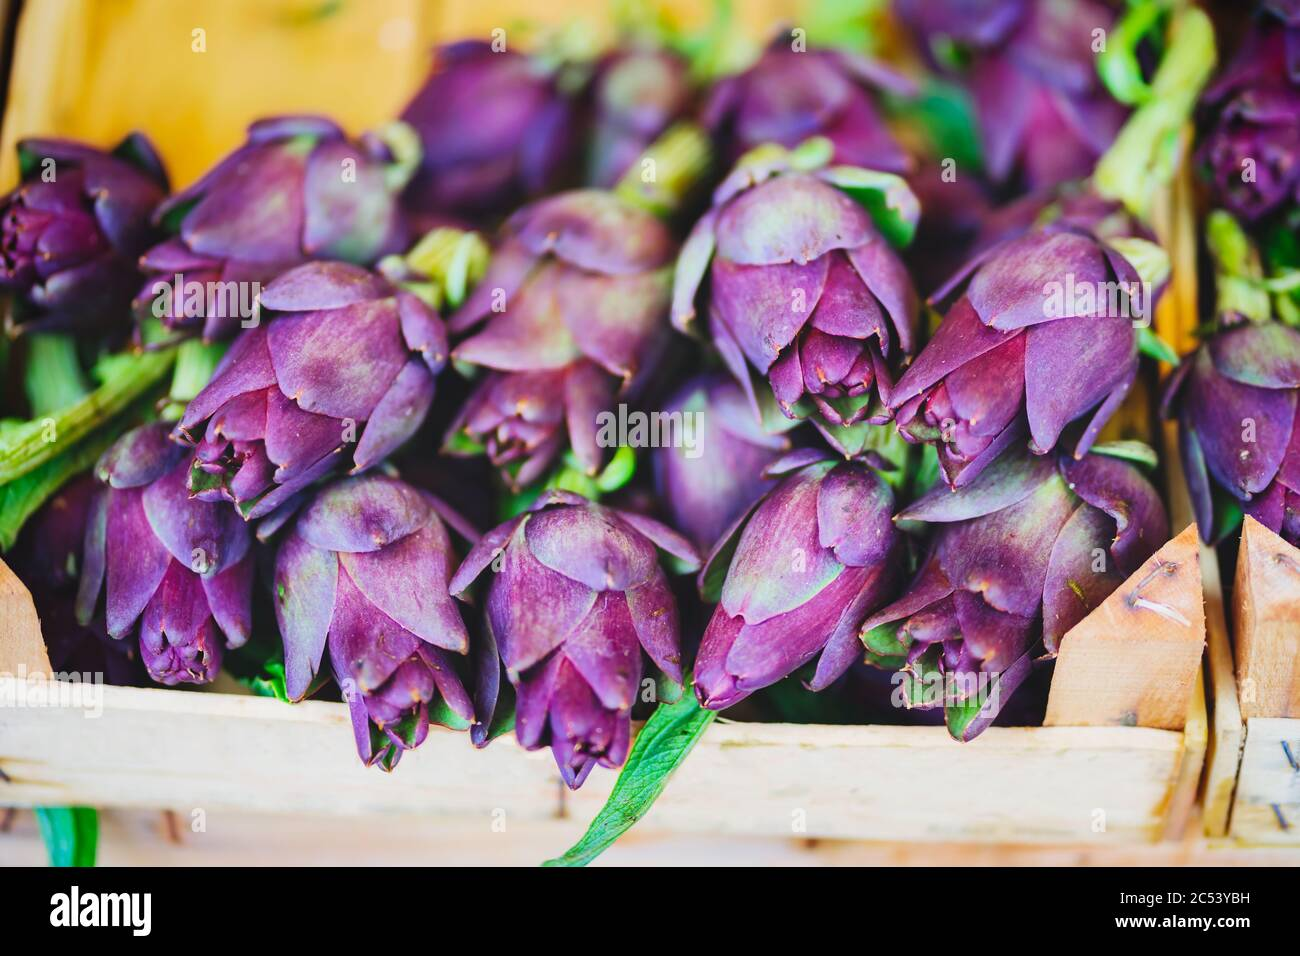 Fresh artichokes of venezia market also called Carciofi in italian language. Italy. Stock Photo